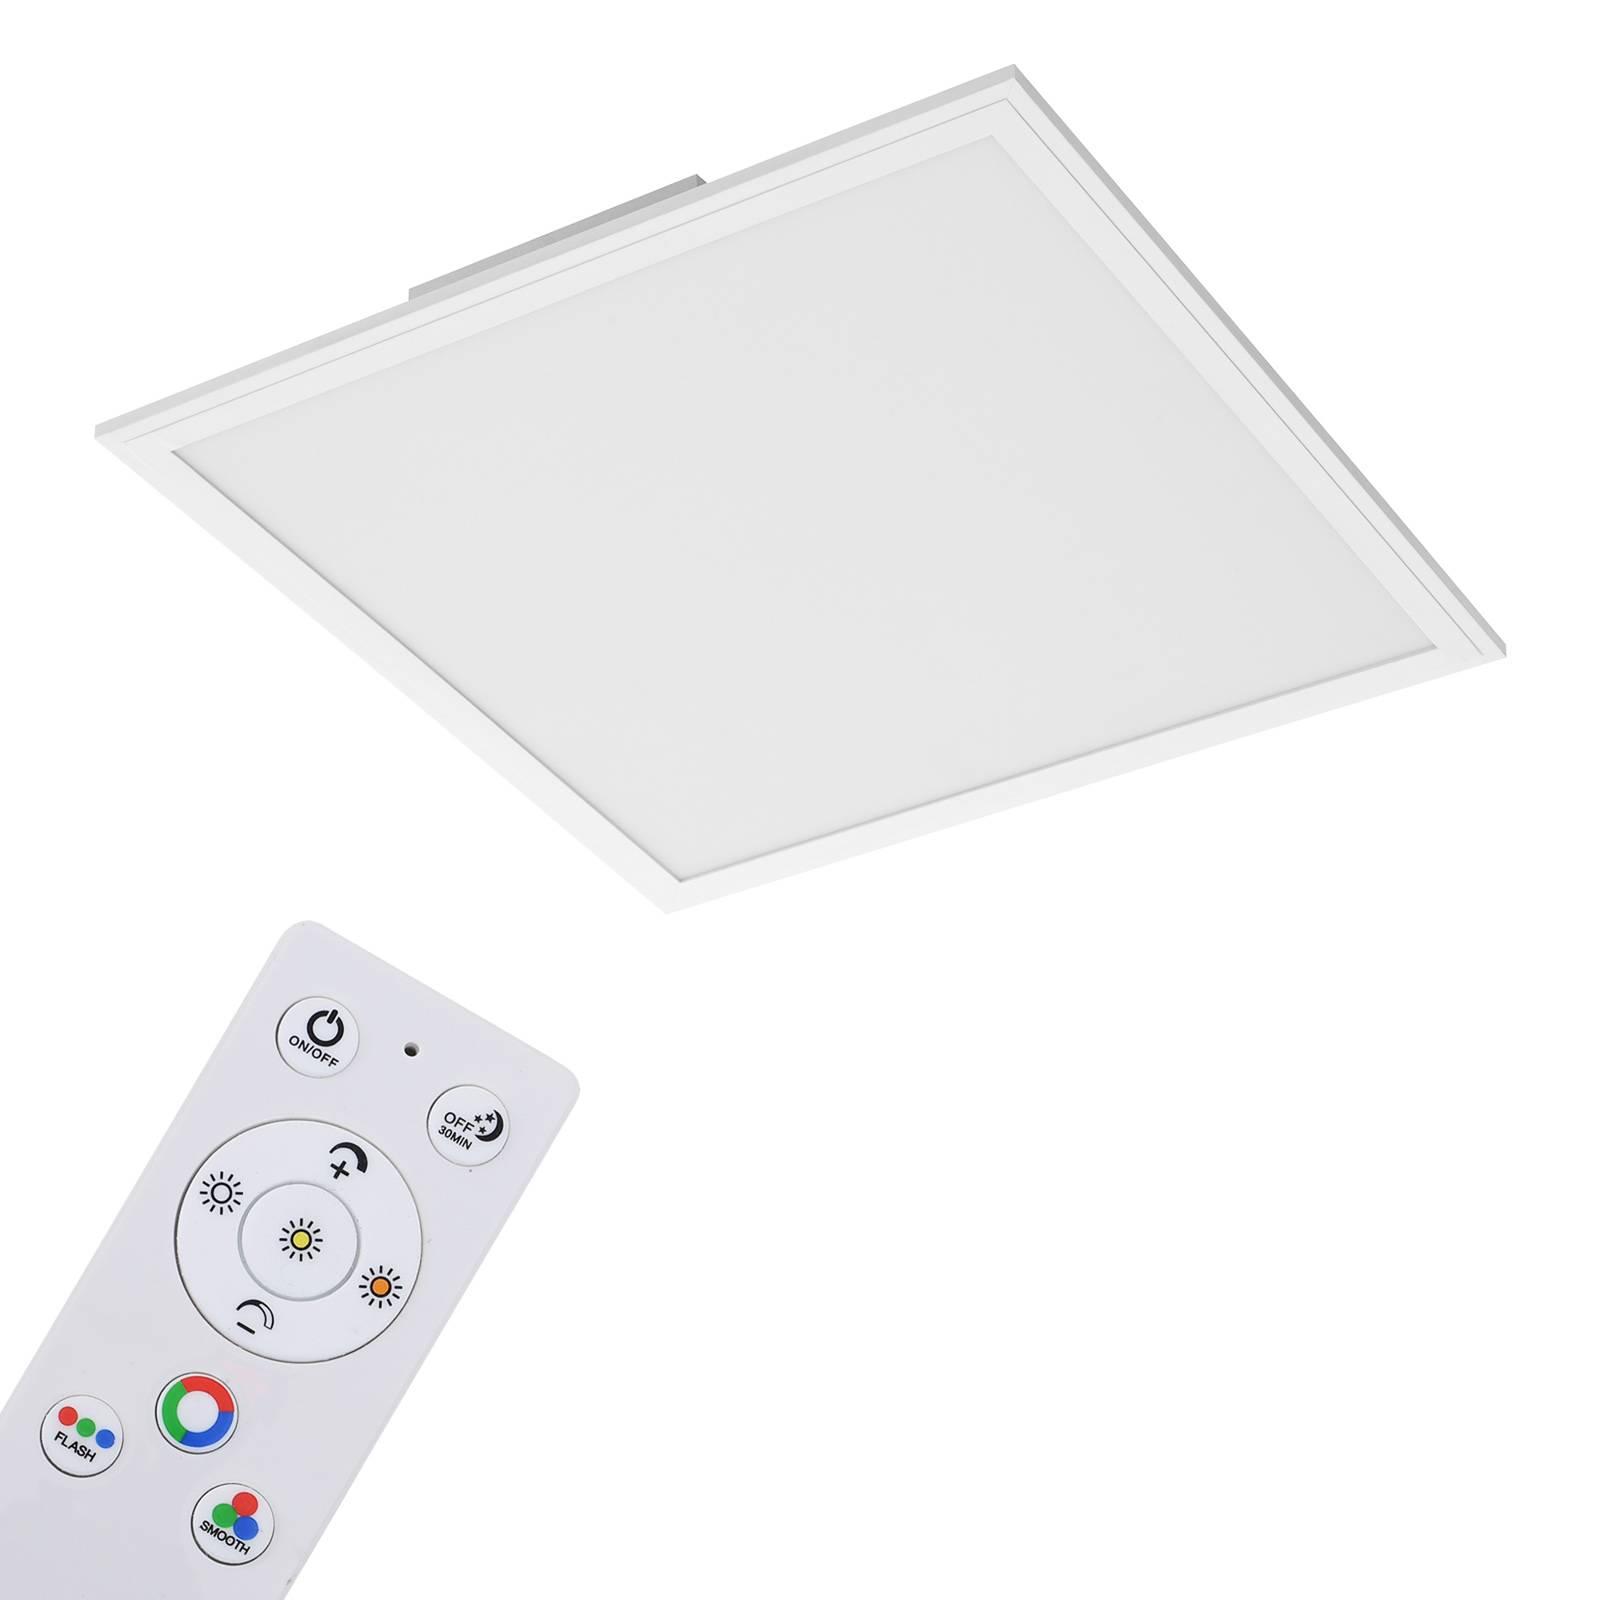 LED-paneeli Colour 45 cm x 45 cm, kaukosäädin